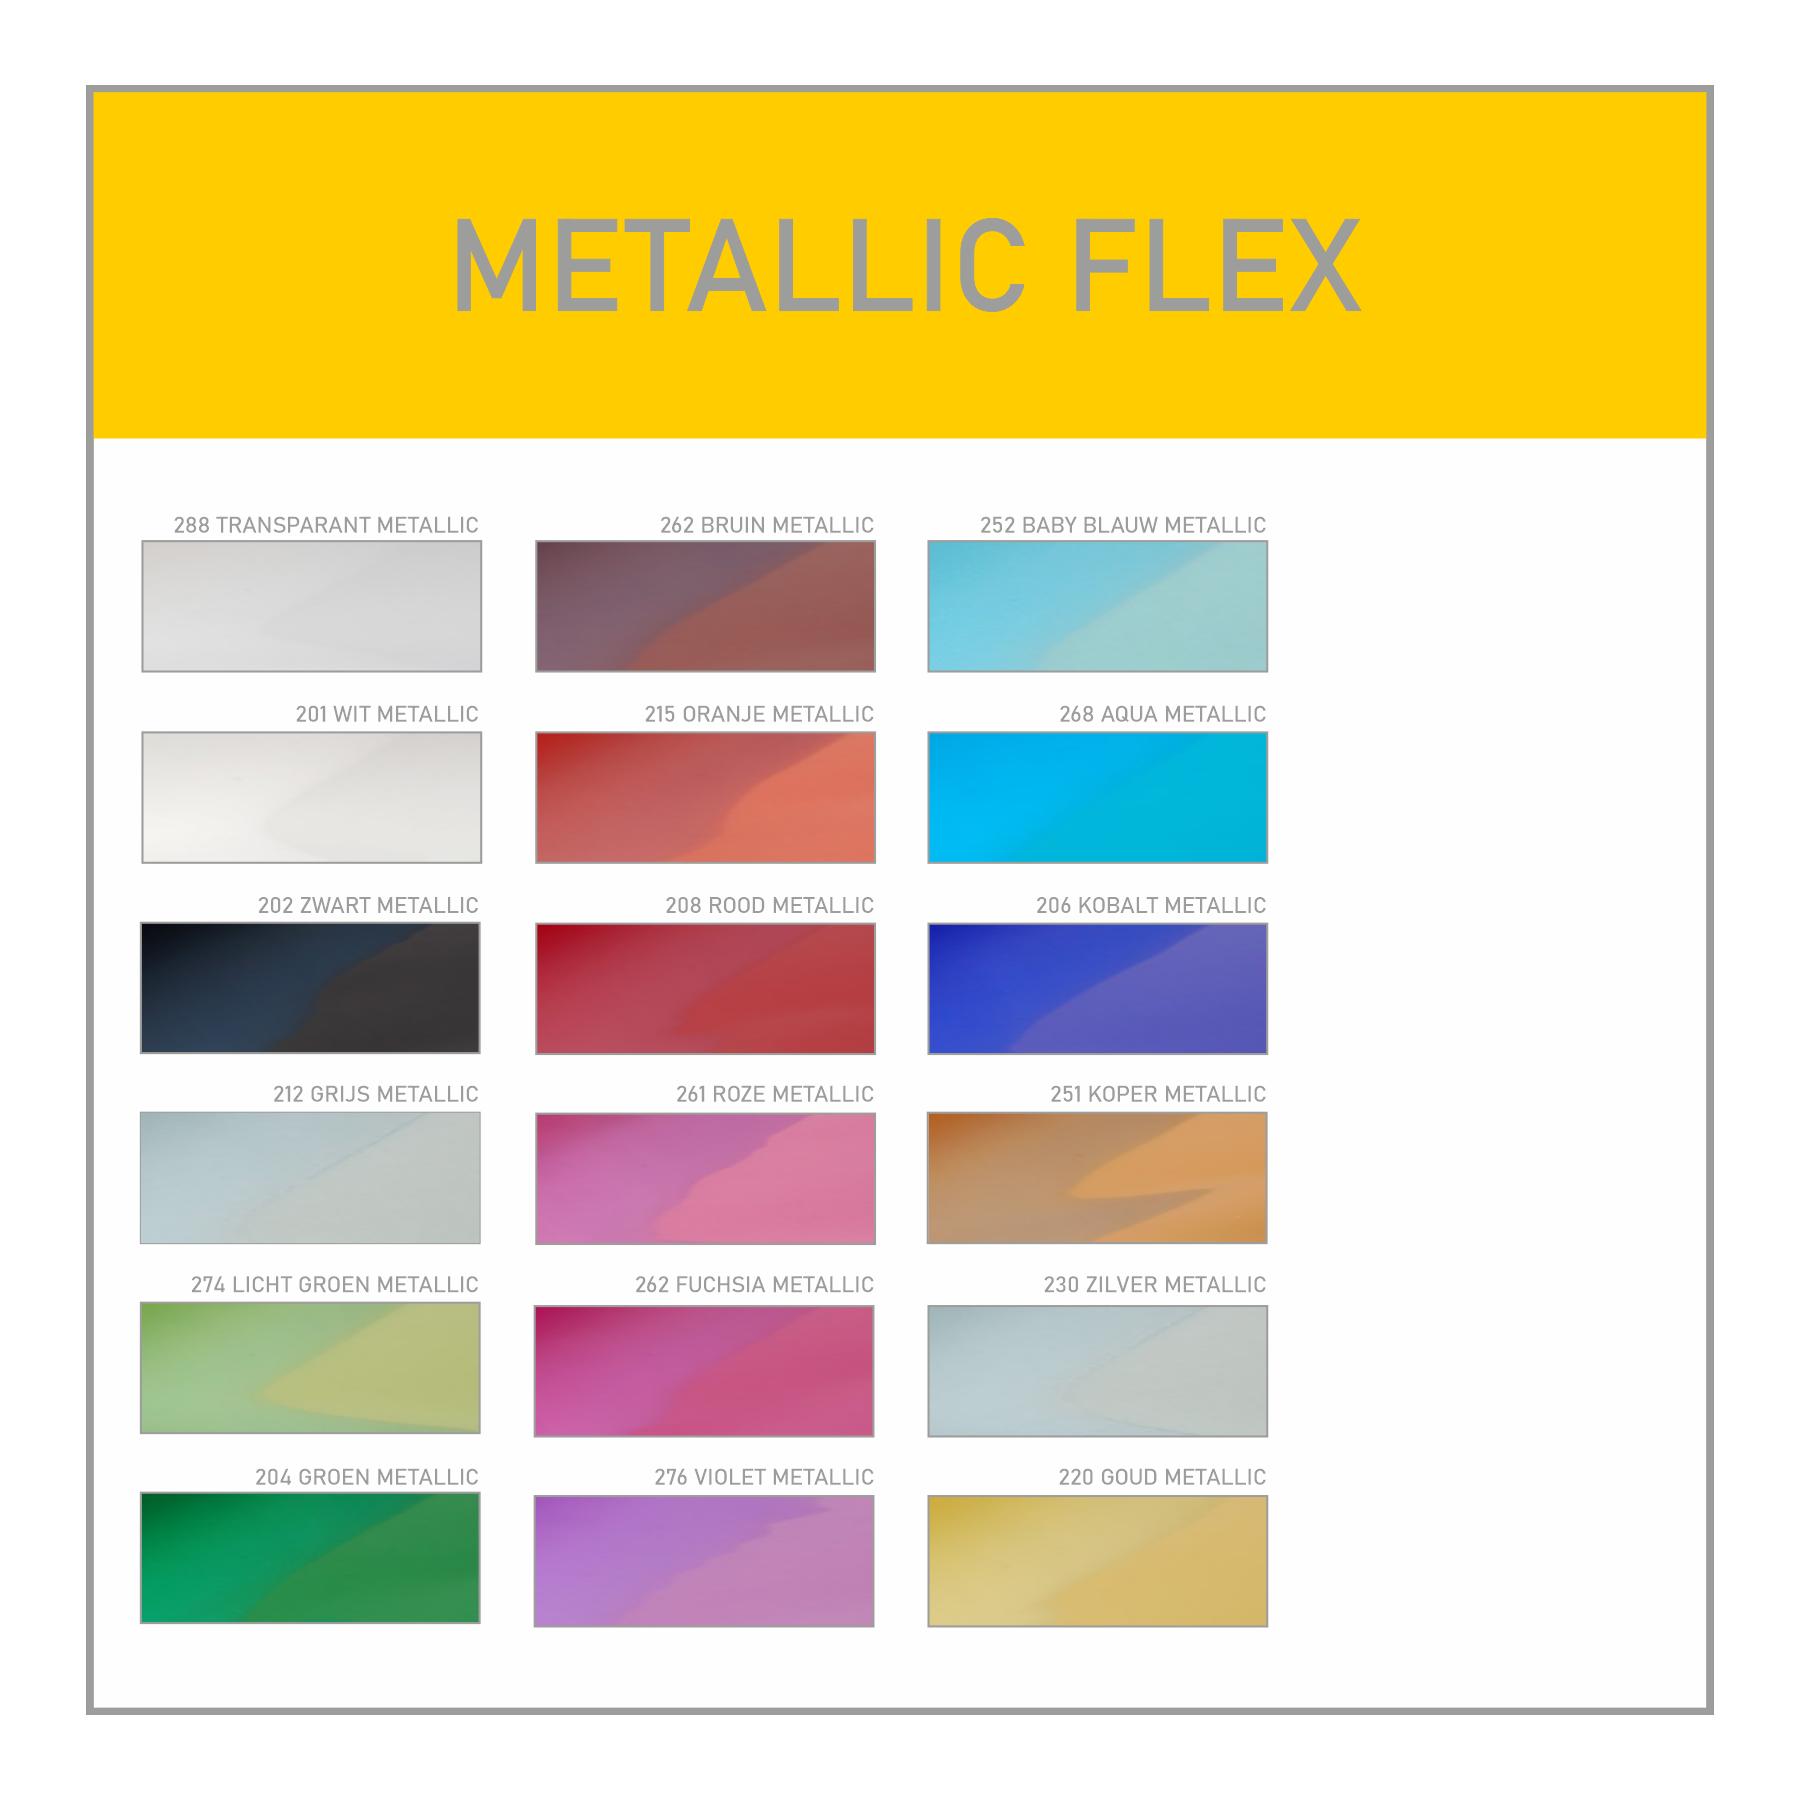 Metallic Flex